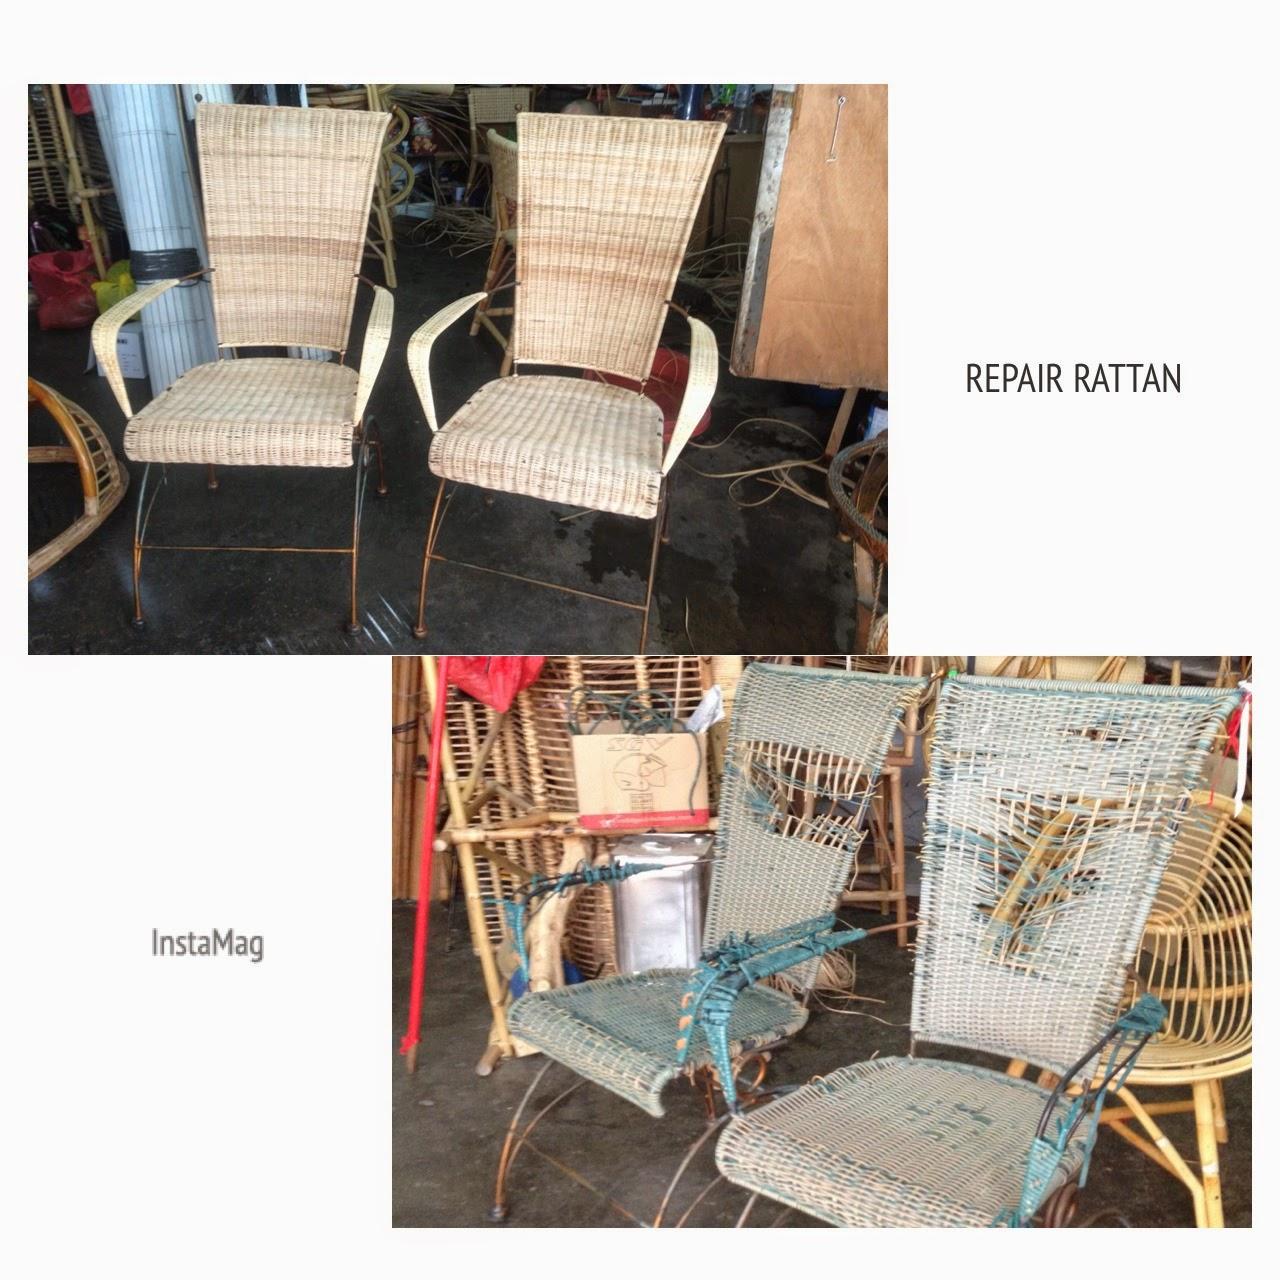 Repair Rattan Furniture Rattan Sofa CaneWicker Chair